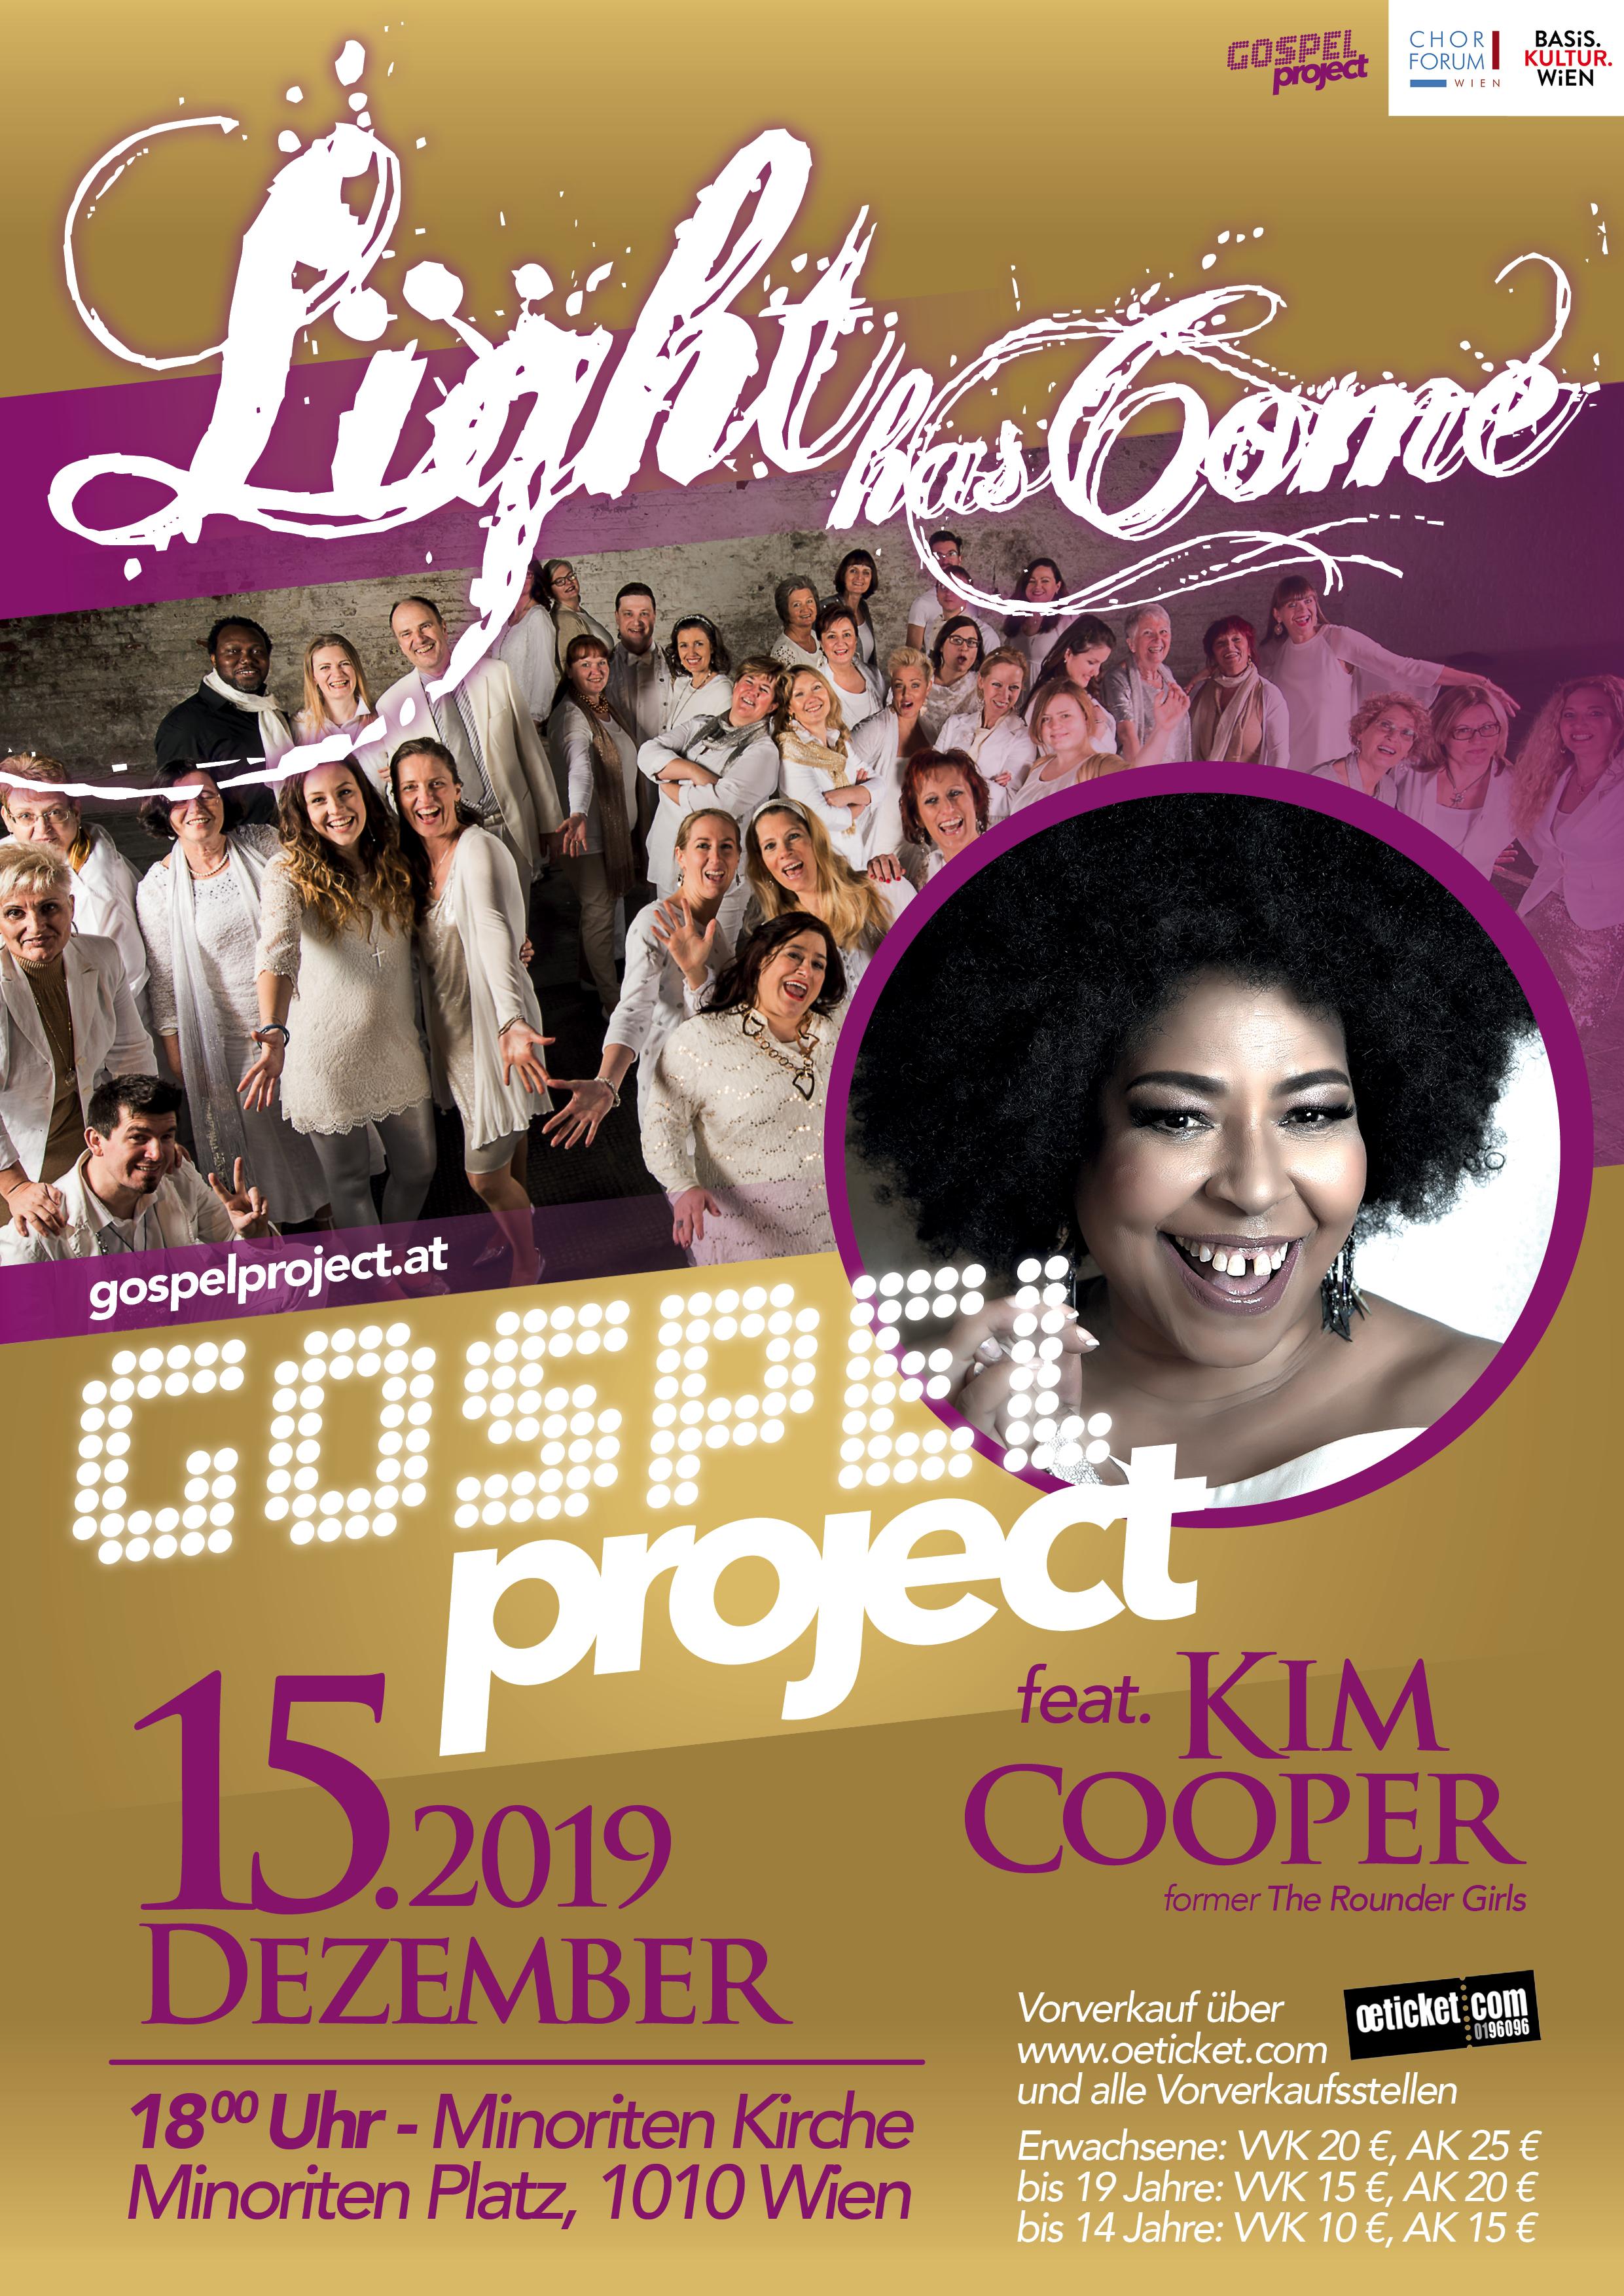 GOSPEL project - Light has come